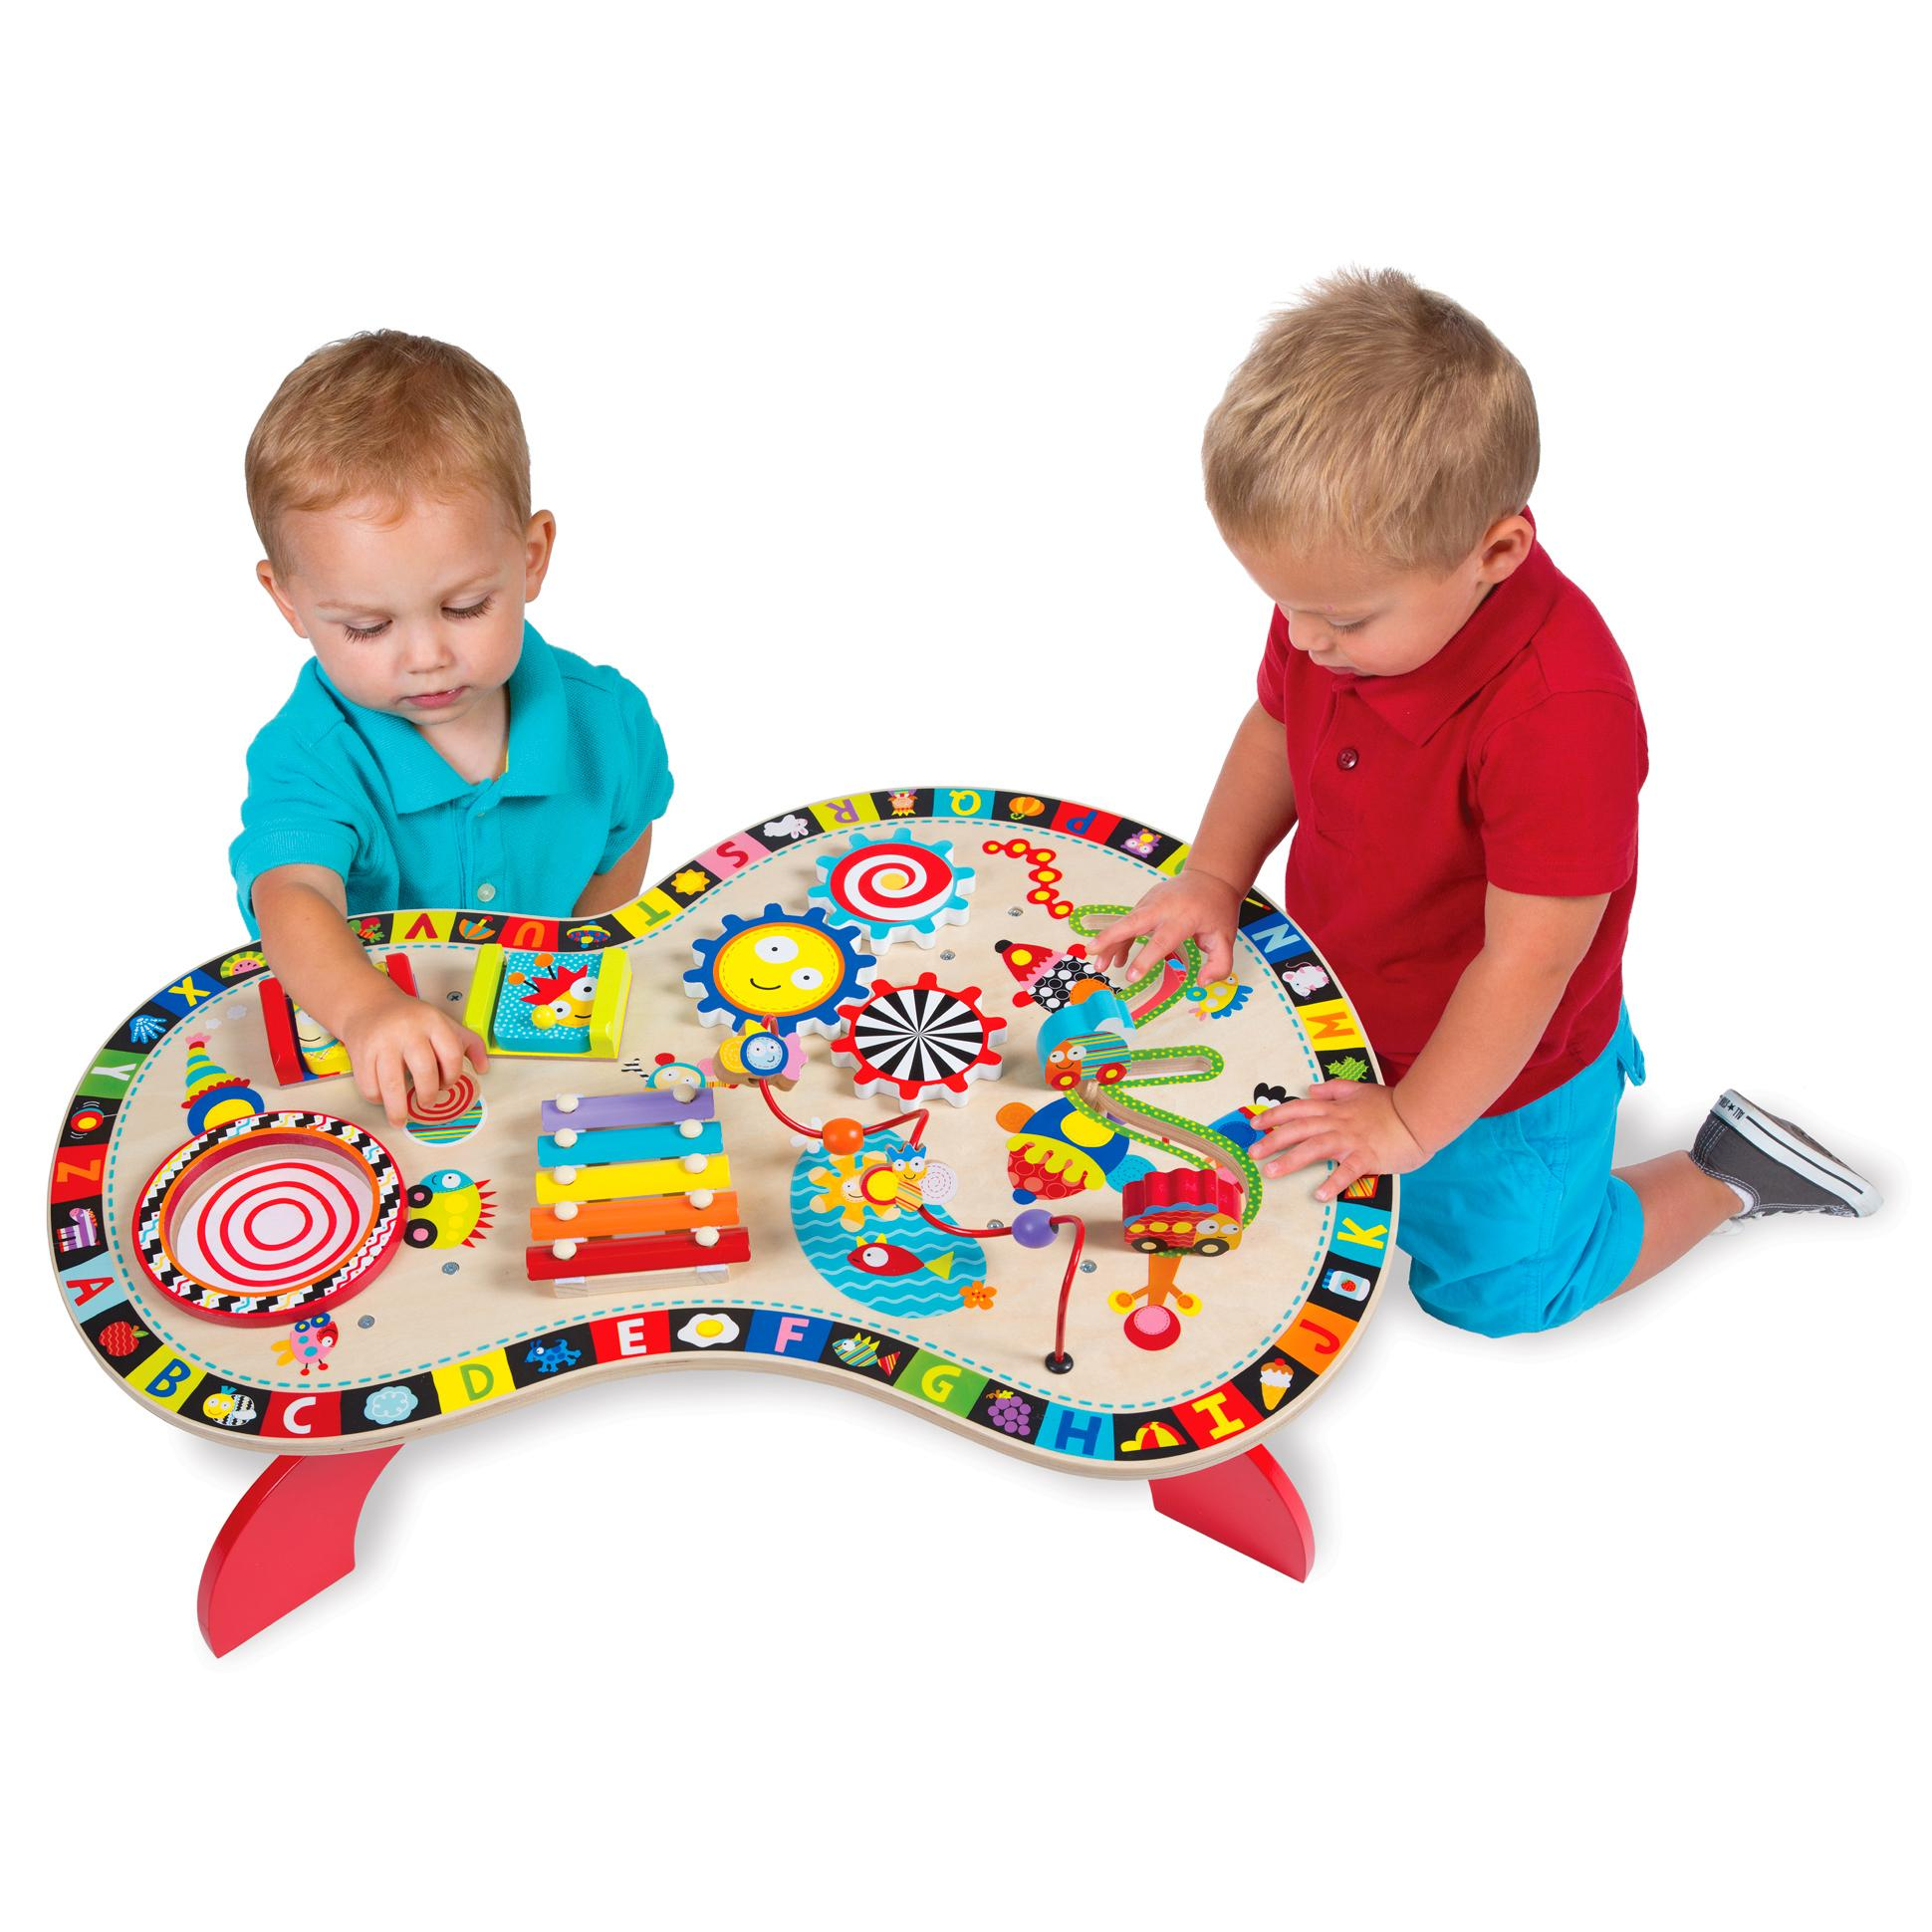 award winning toys 1 year old Toys Model Ideas